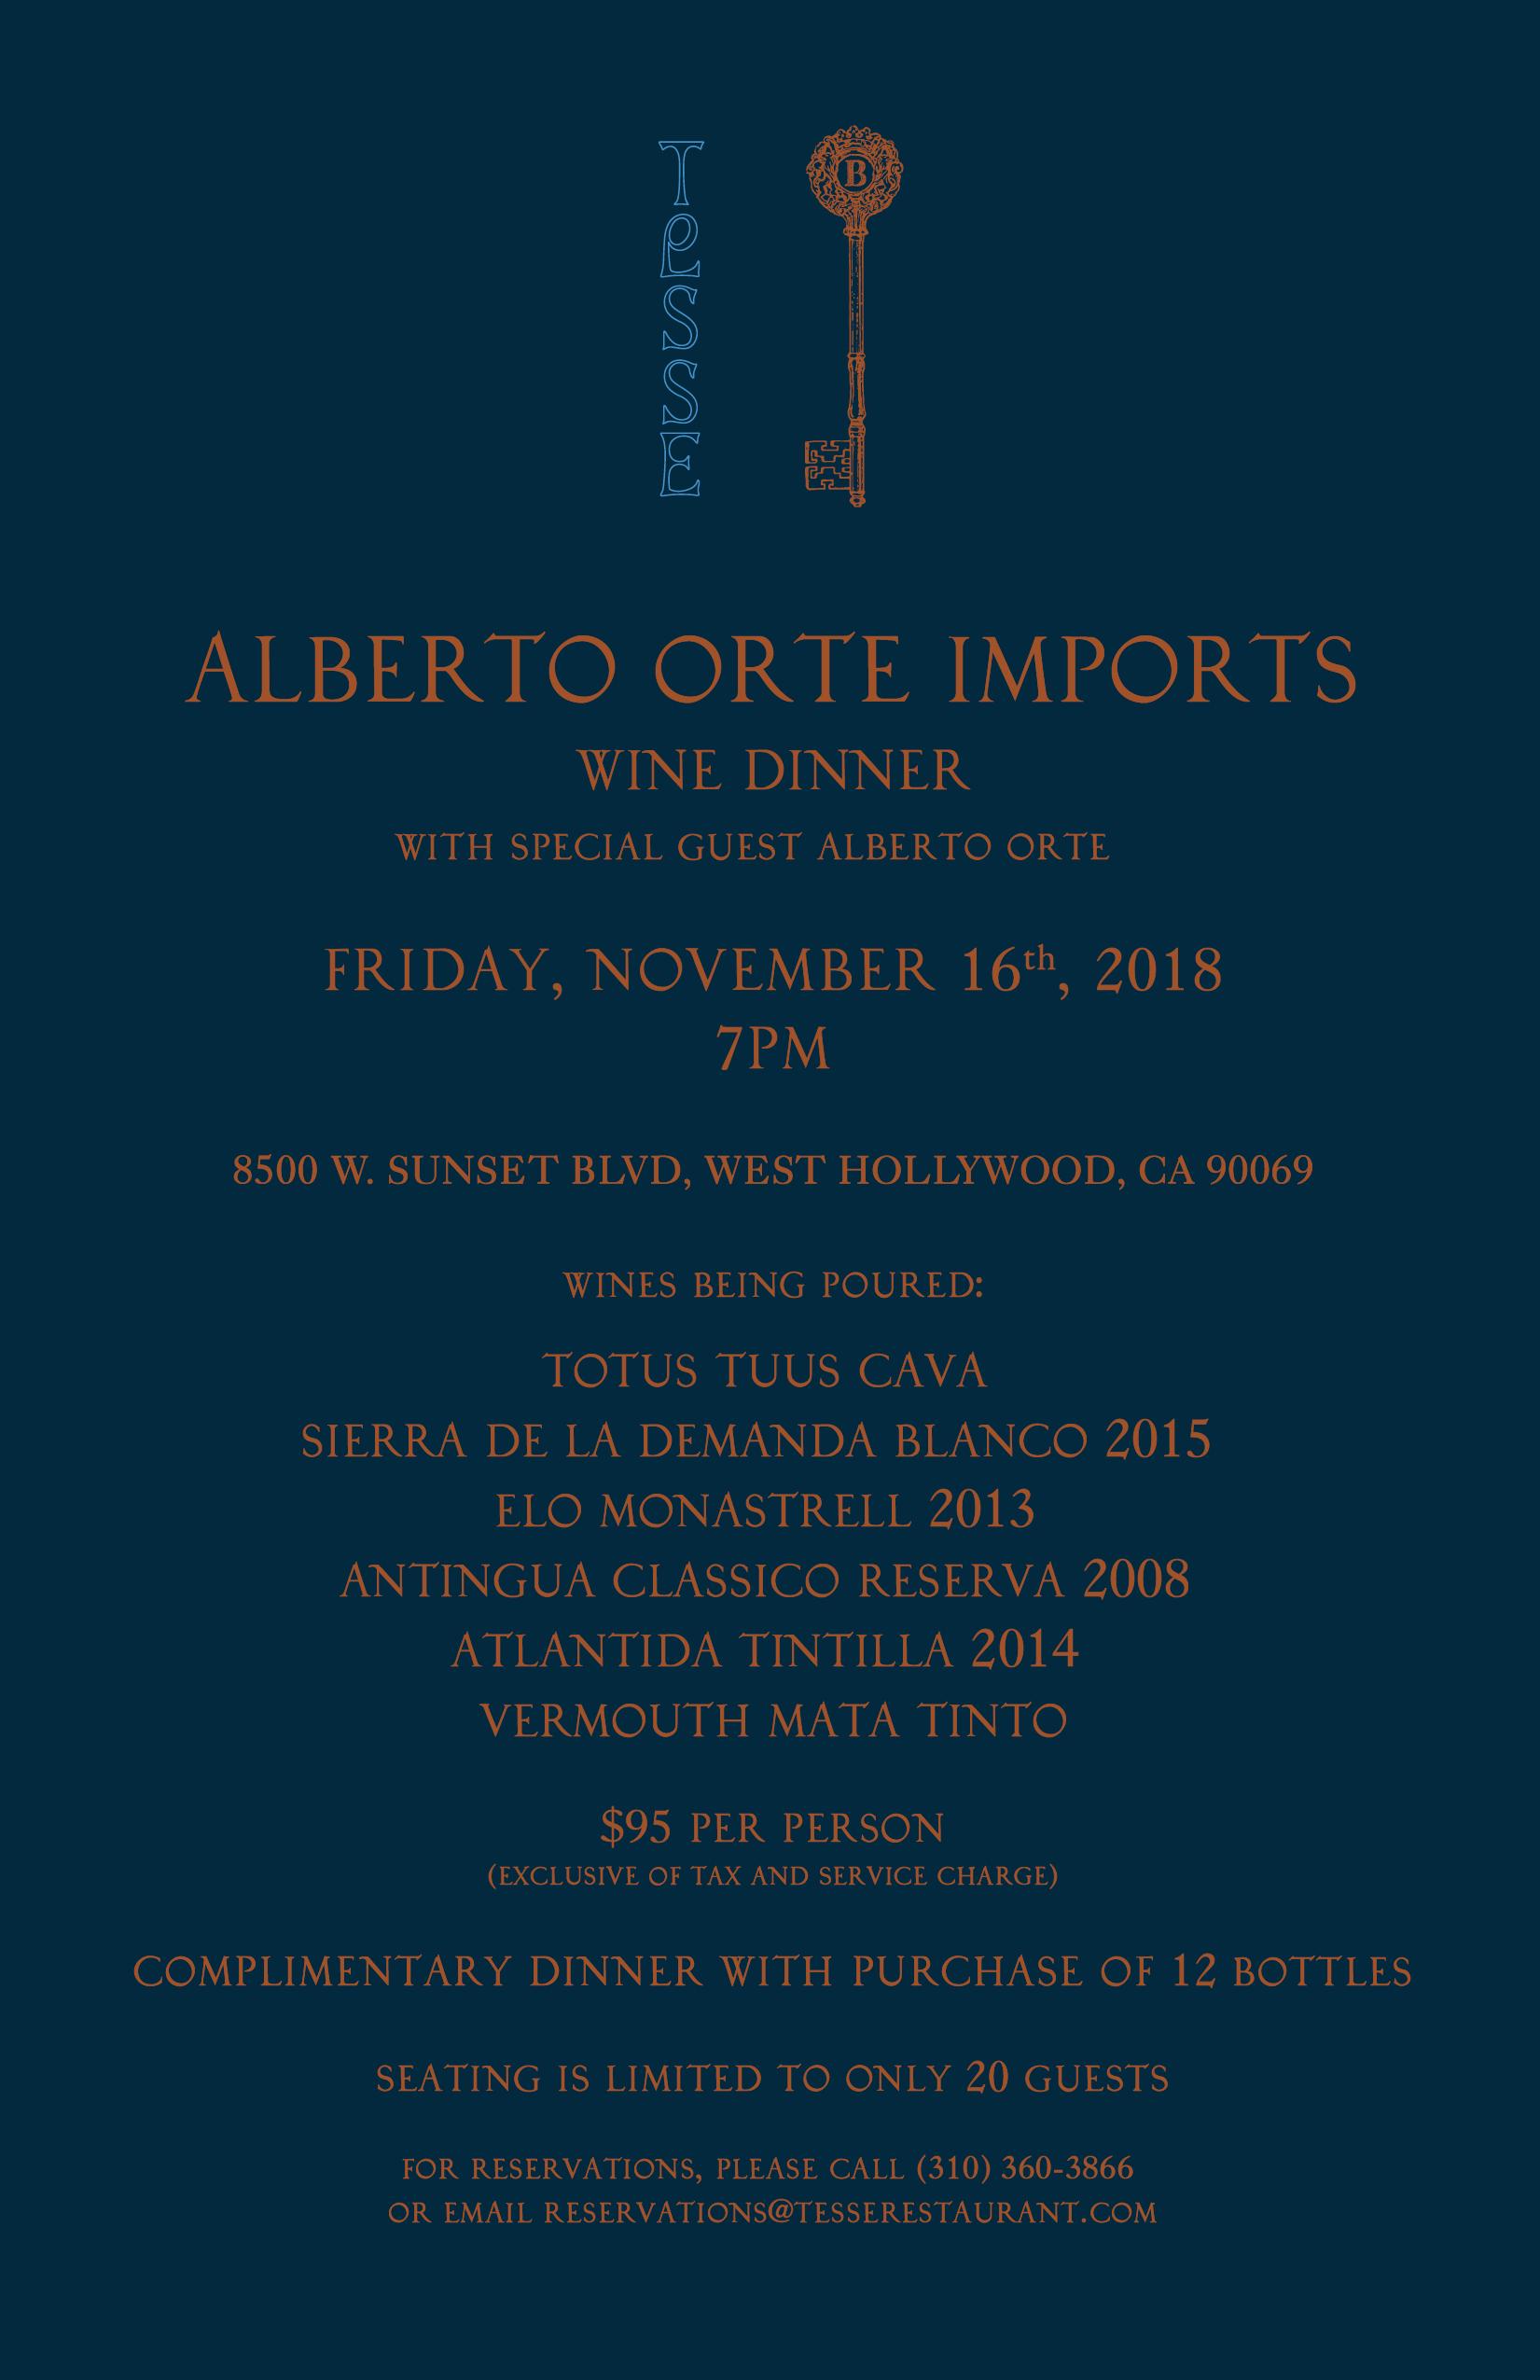 Alberto Orte Wine Dinner Invite.png